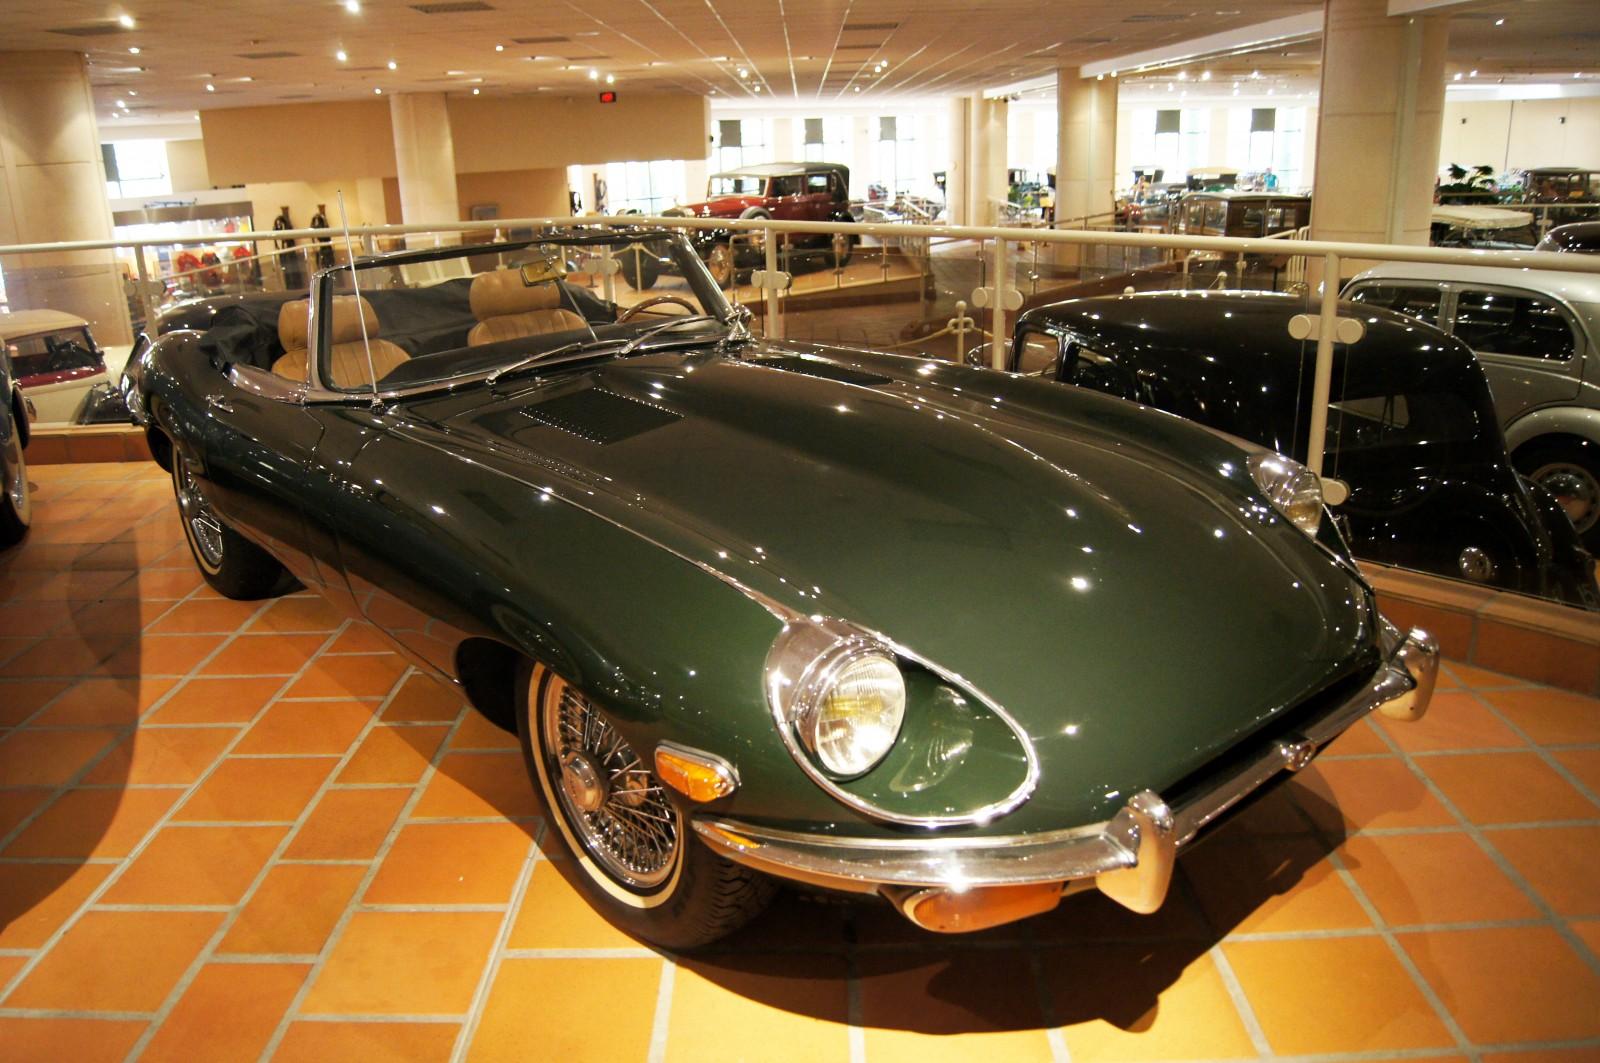 Jaguar Type E Cabriolet Museum Exhibit CarMuseumcom - Sports cars international